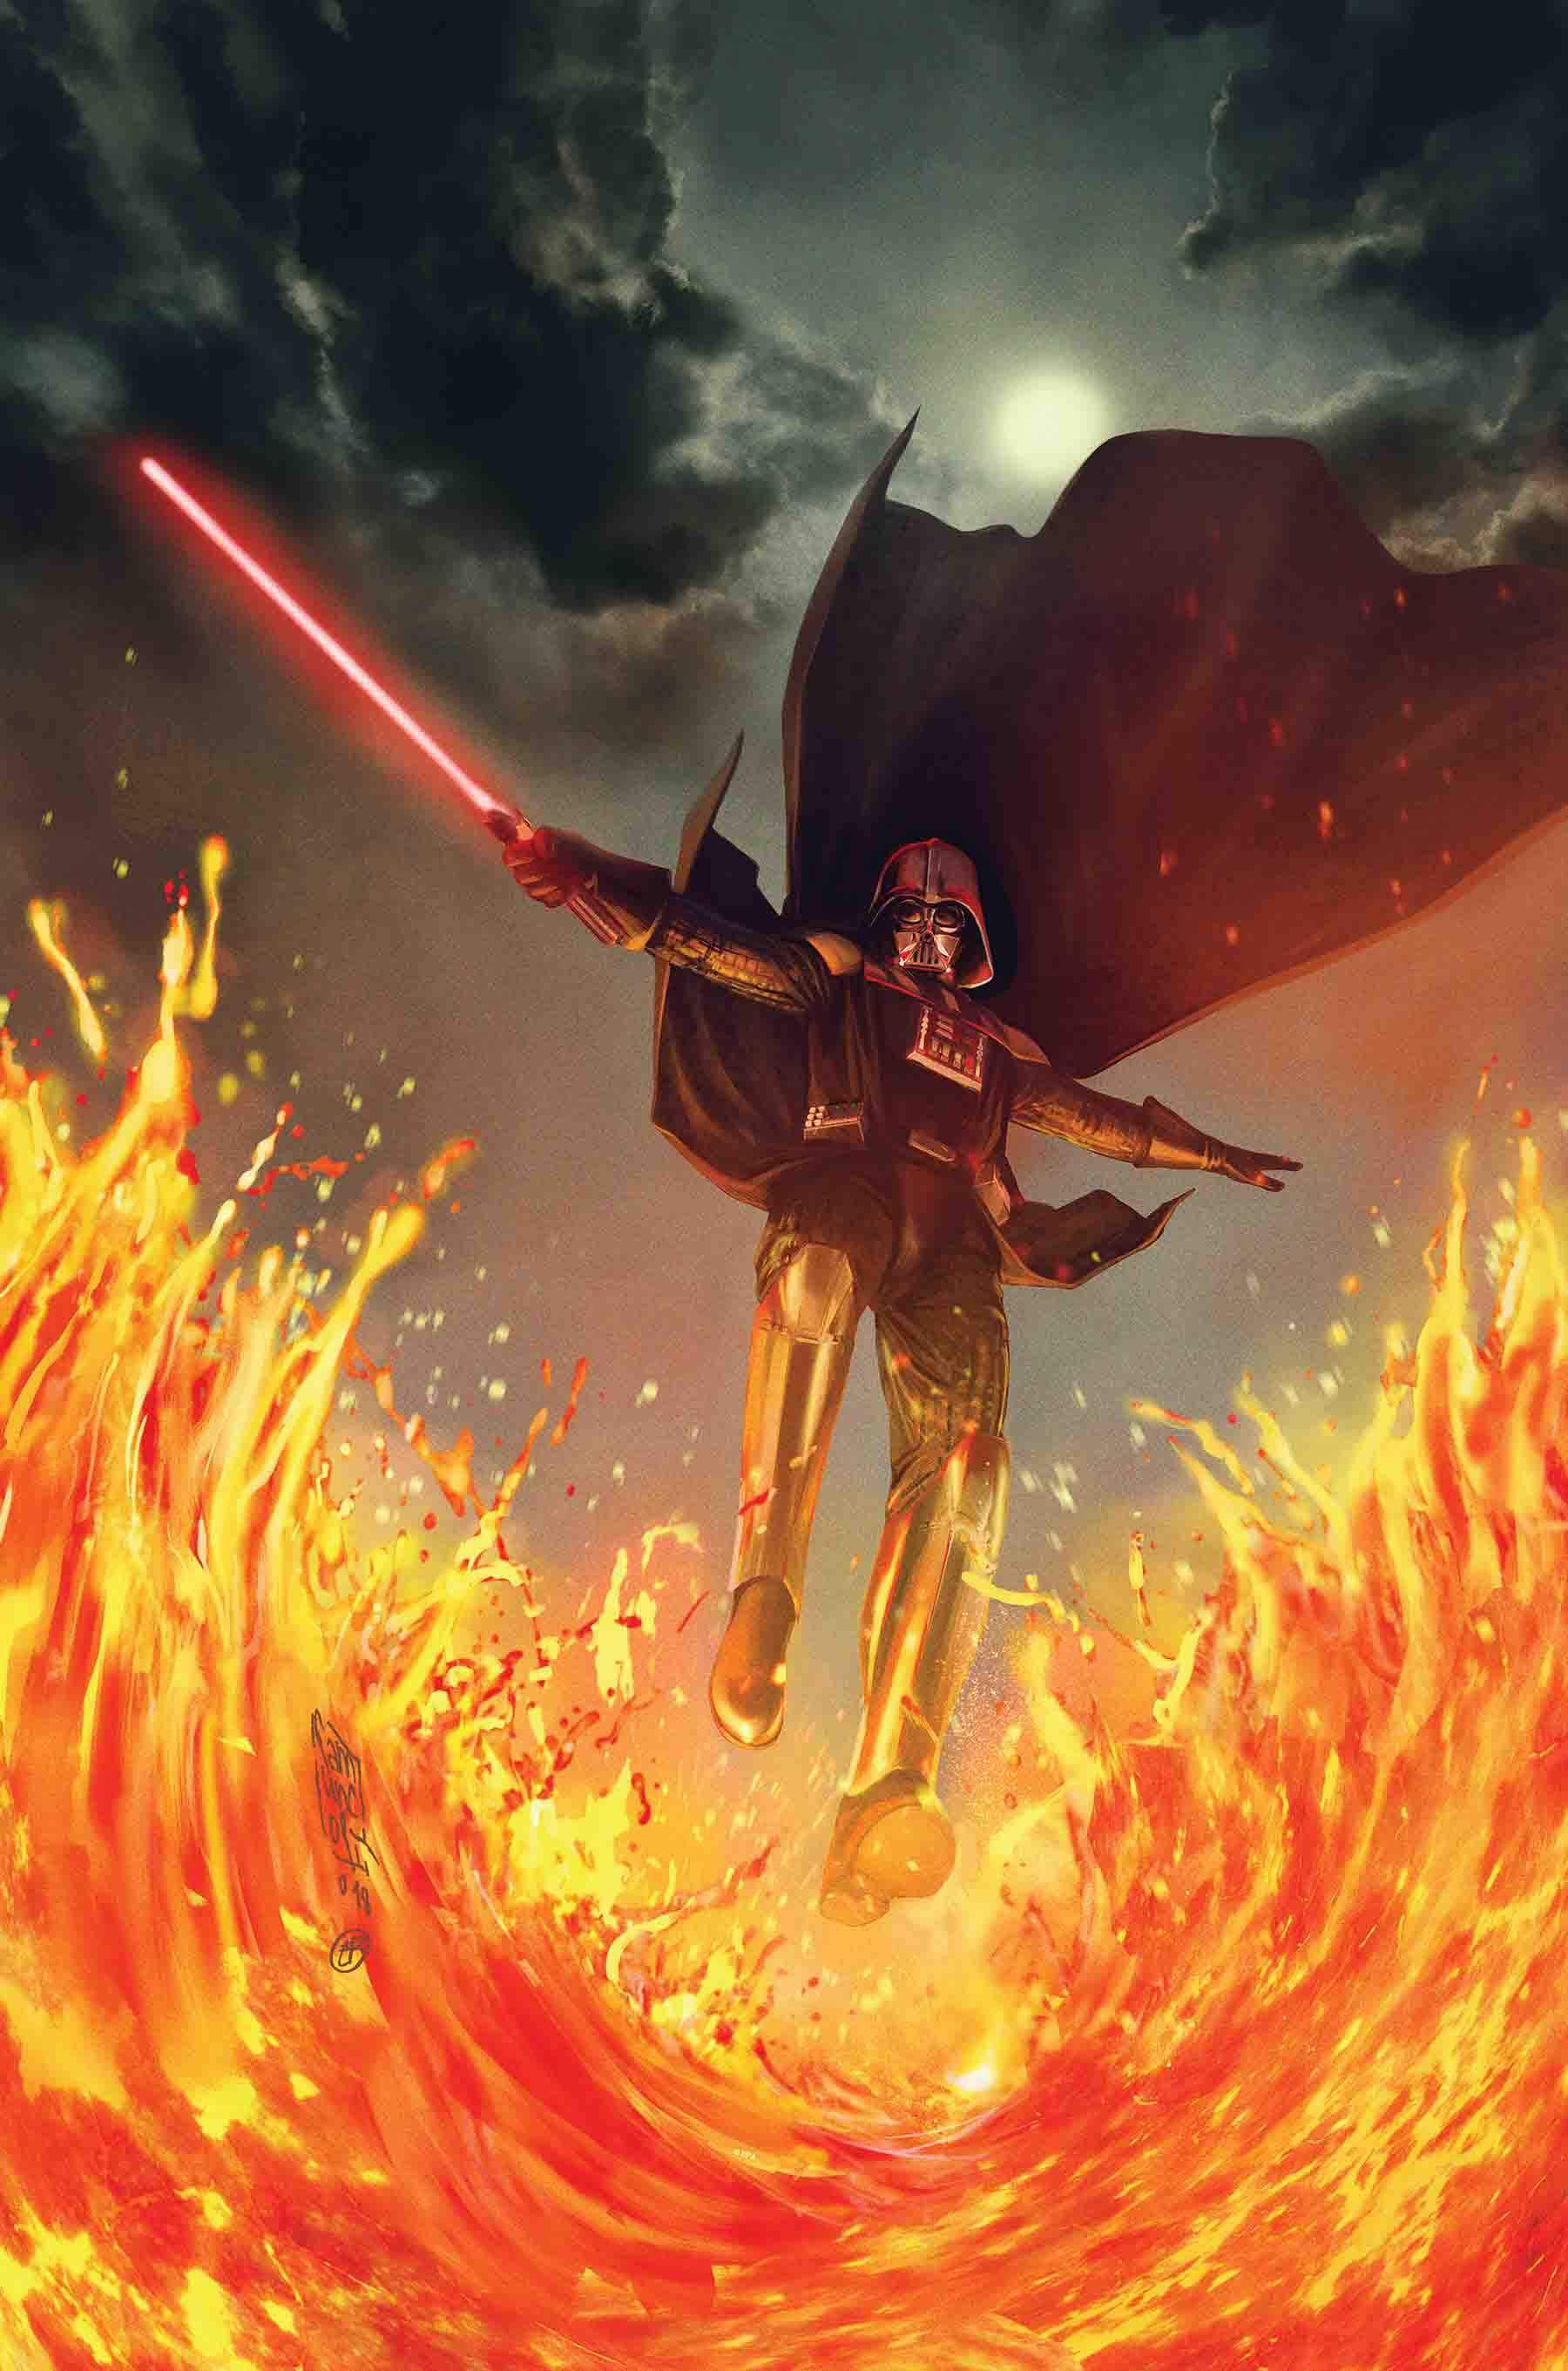 Darth Vader looks badass in this